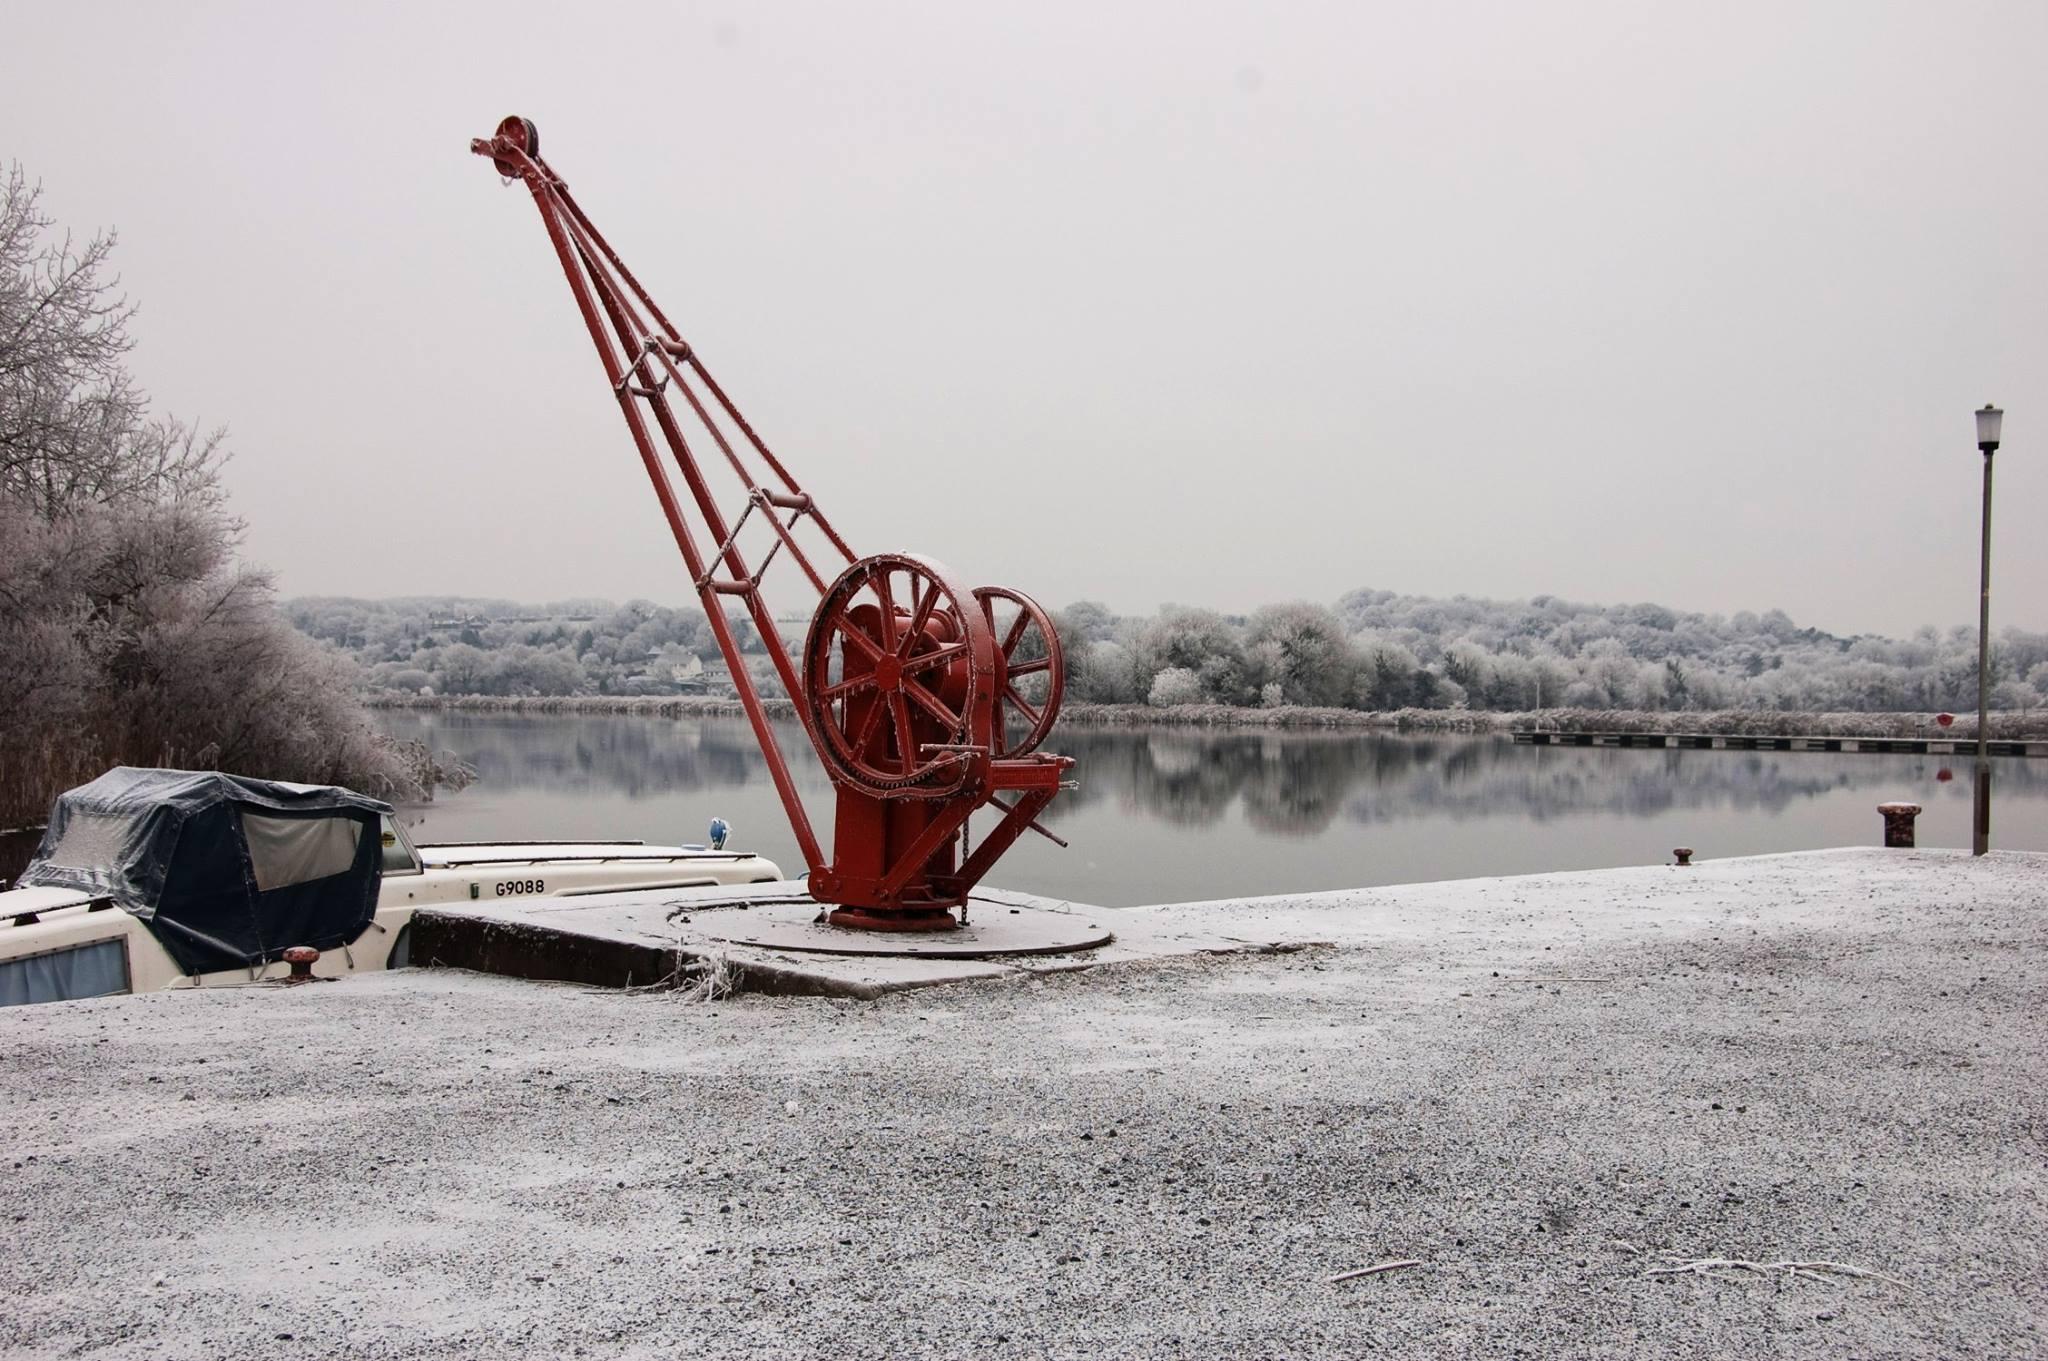 Portumna Water Crane in Winter - Visit Galway